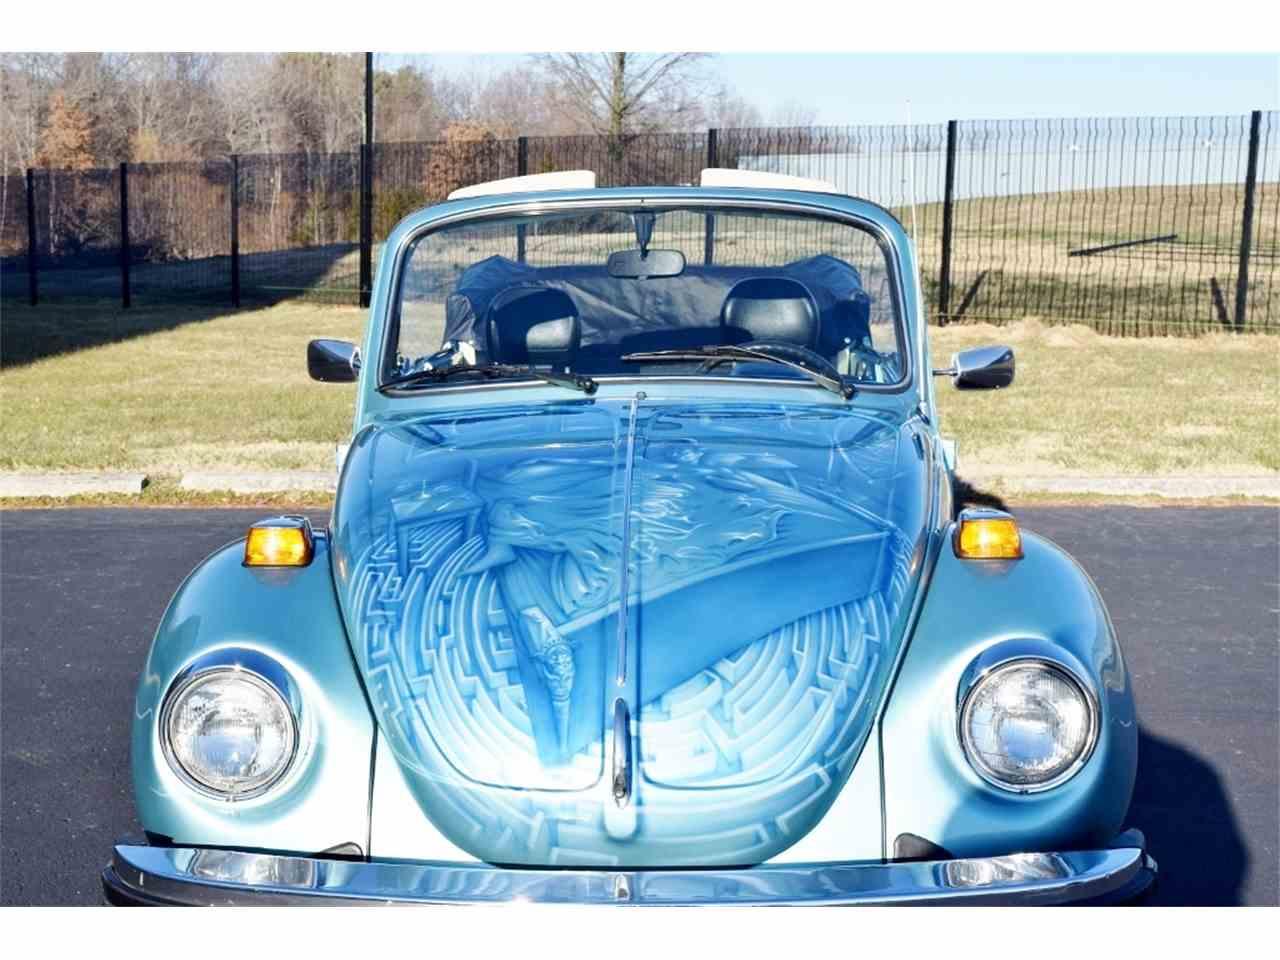 Auto For Sale Fredericksburg Va: 1979 Volkswagen Super Beetle For Sale